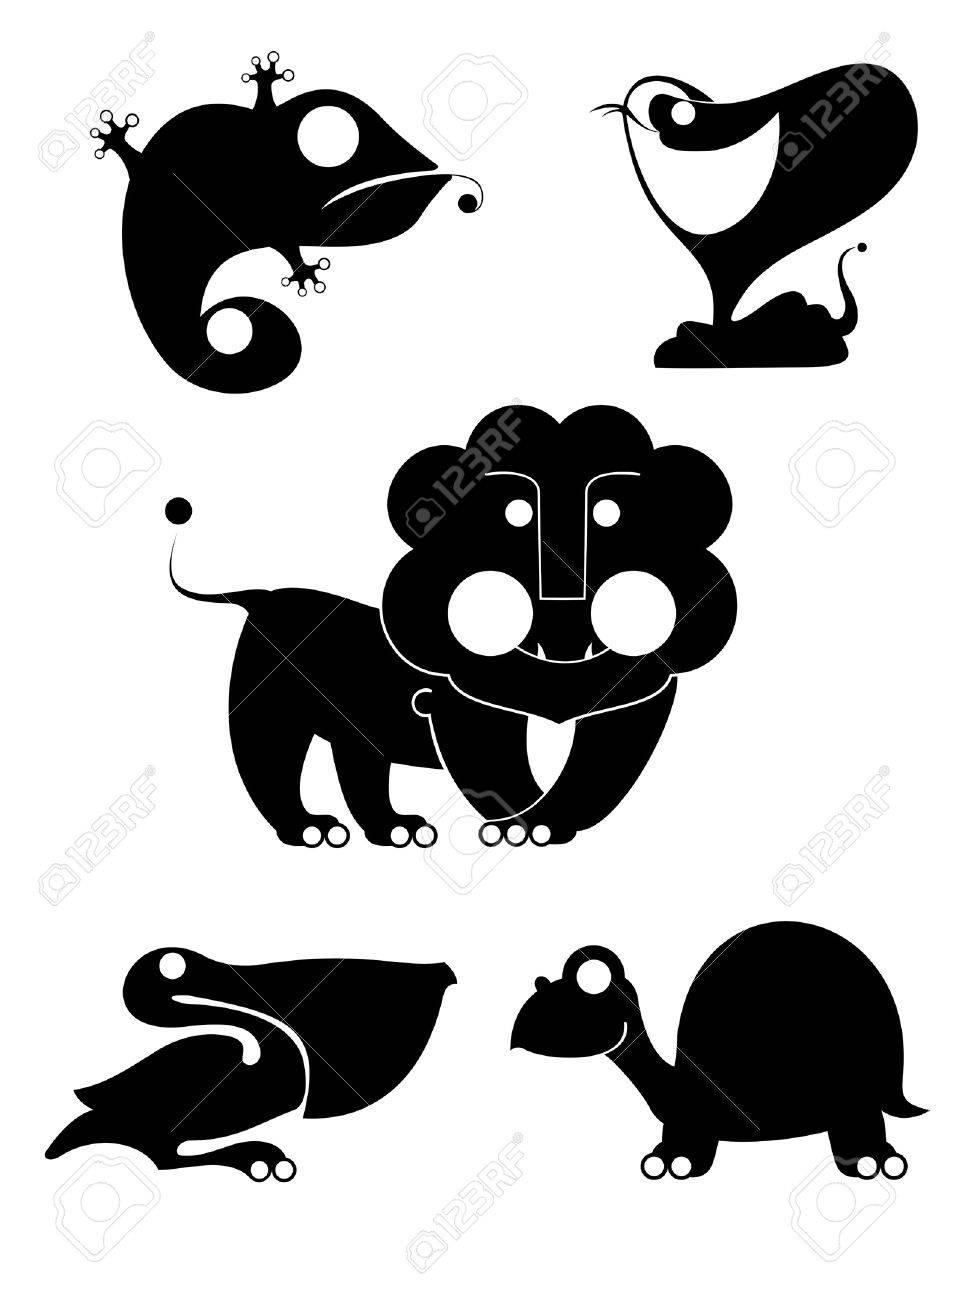 Vector original art animal silhouettes collection for design Stock Vector - 21736039